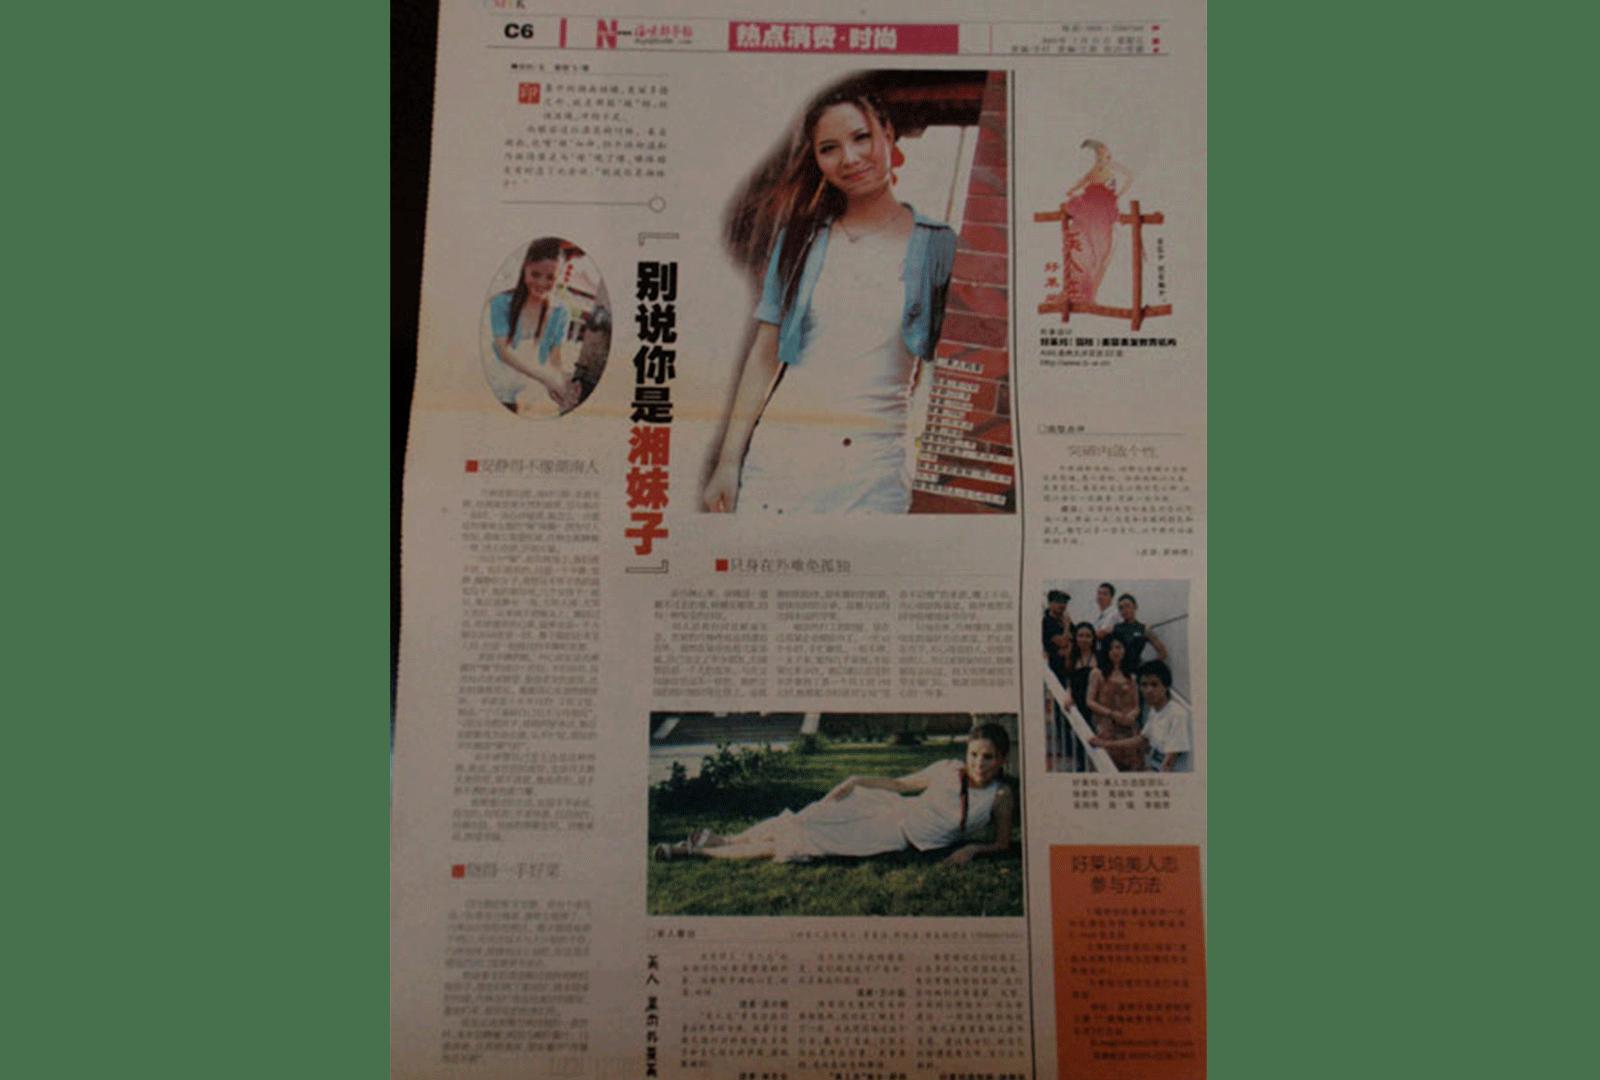 _0000s_0010_海峡都市报-2005-7-15-热点消费·时尚